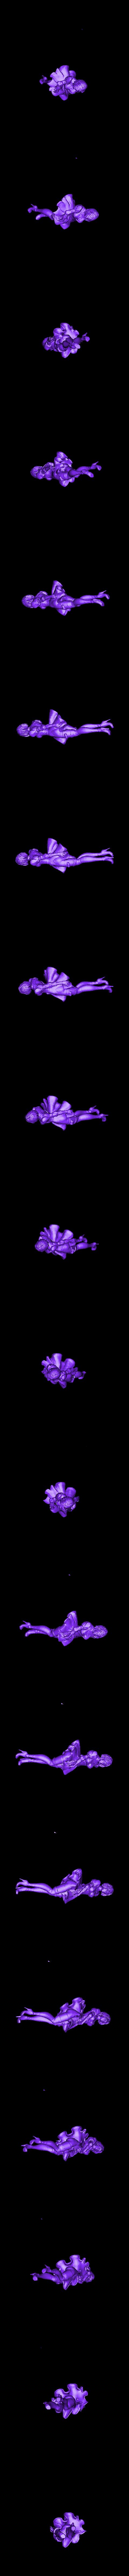 AlimeGirl.stl Download free STL file NieR: Automata with KATANA • Model to 3D print, Boris3dStudio